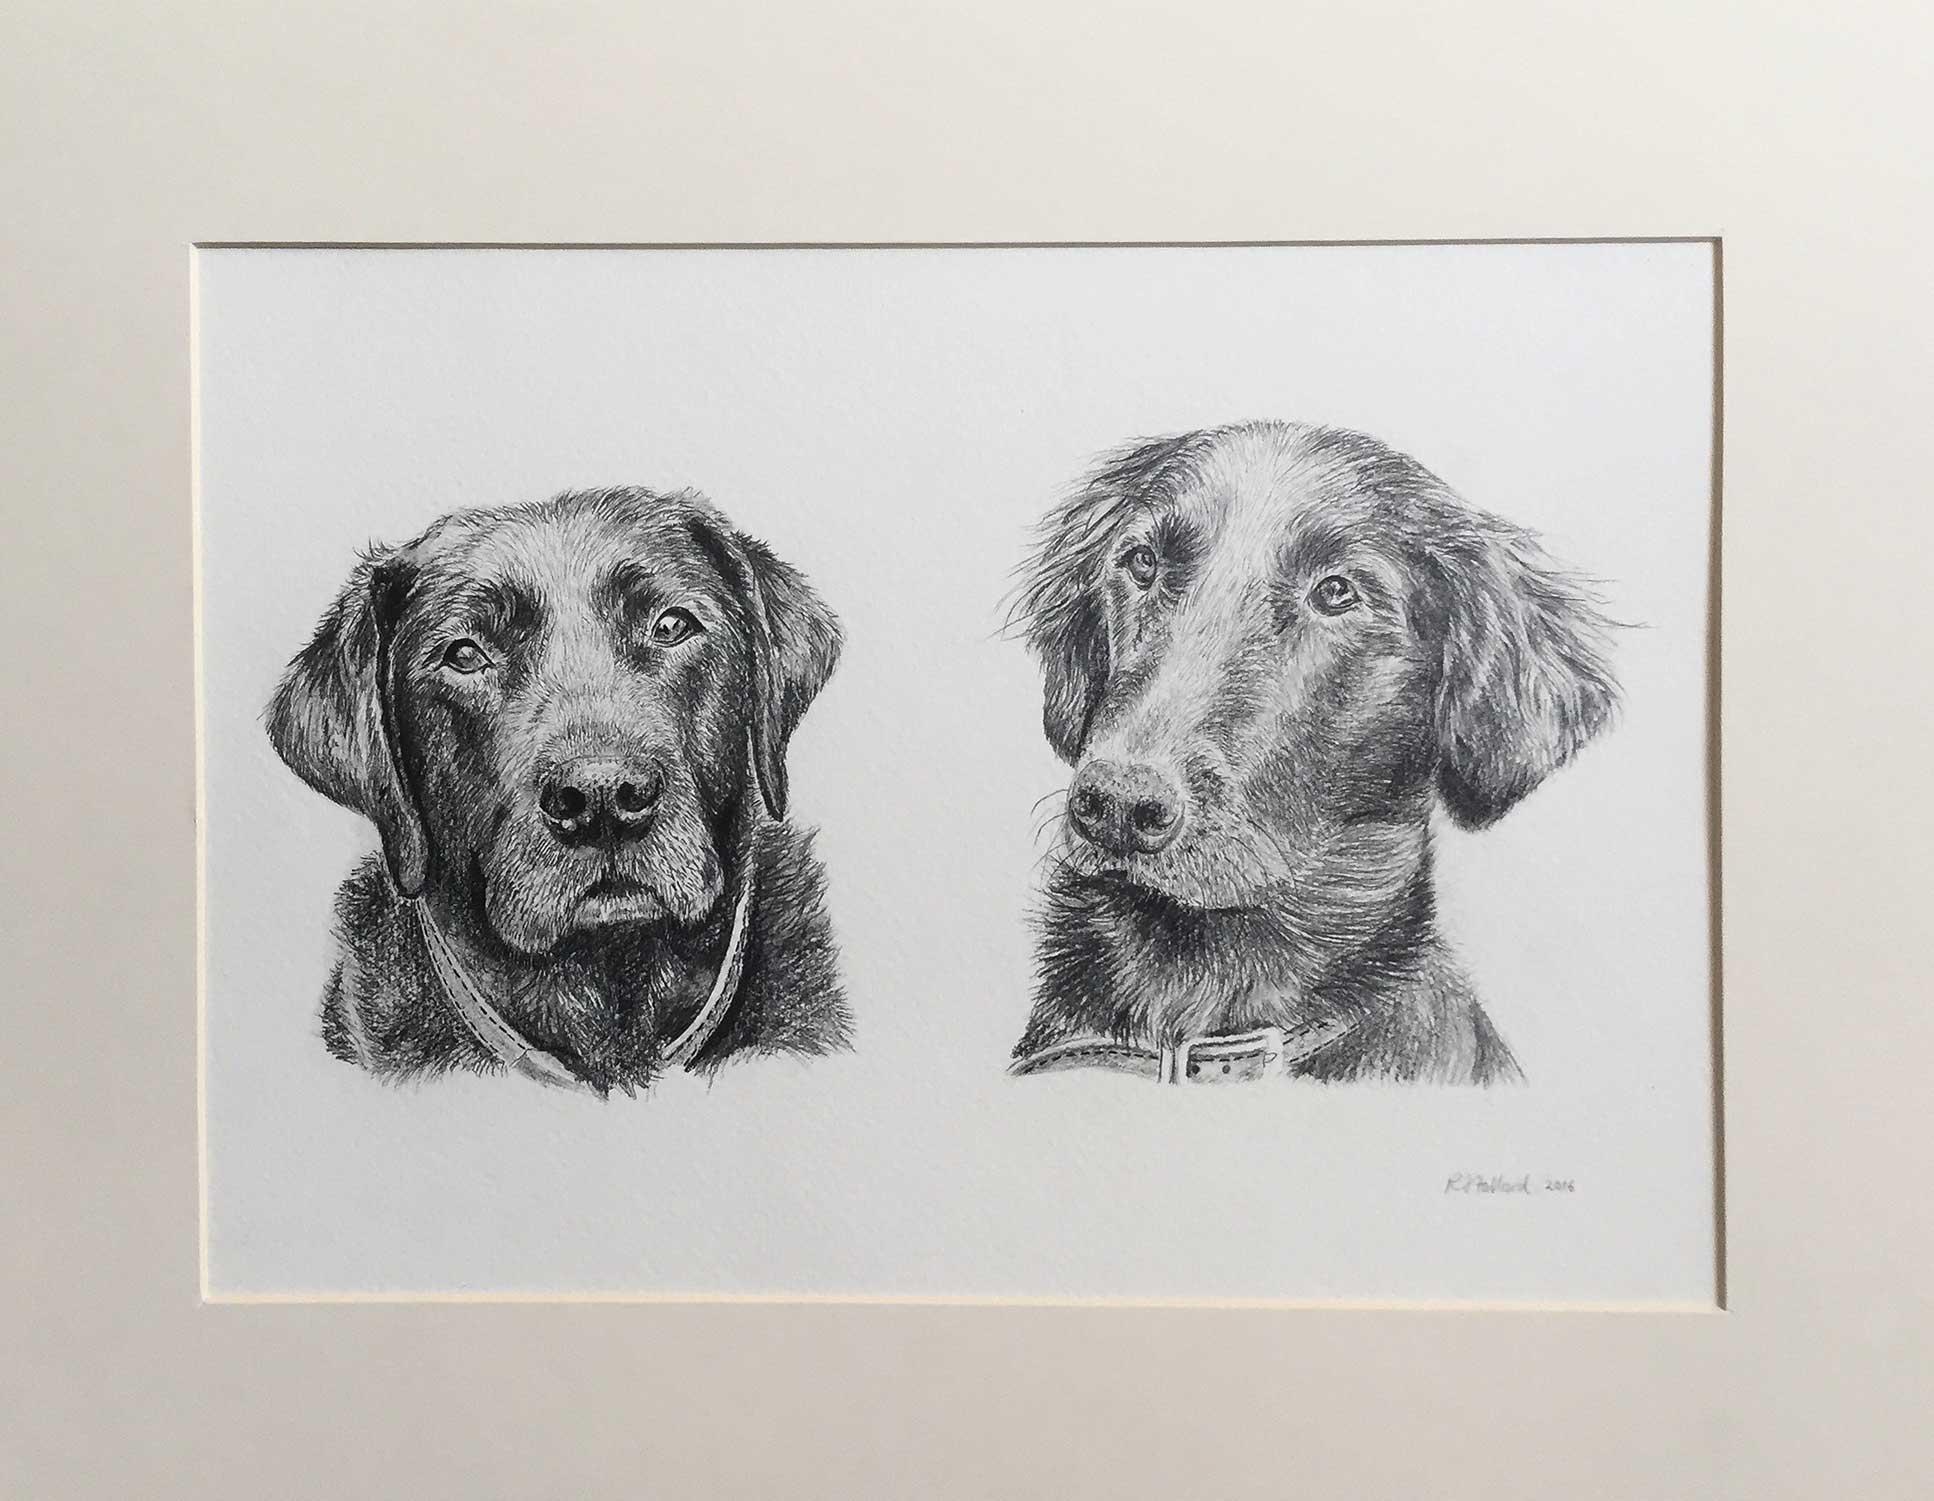 jeannie's-dogs_2.jpg